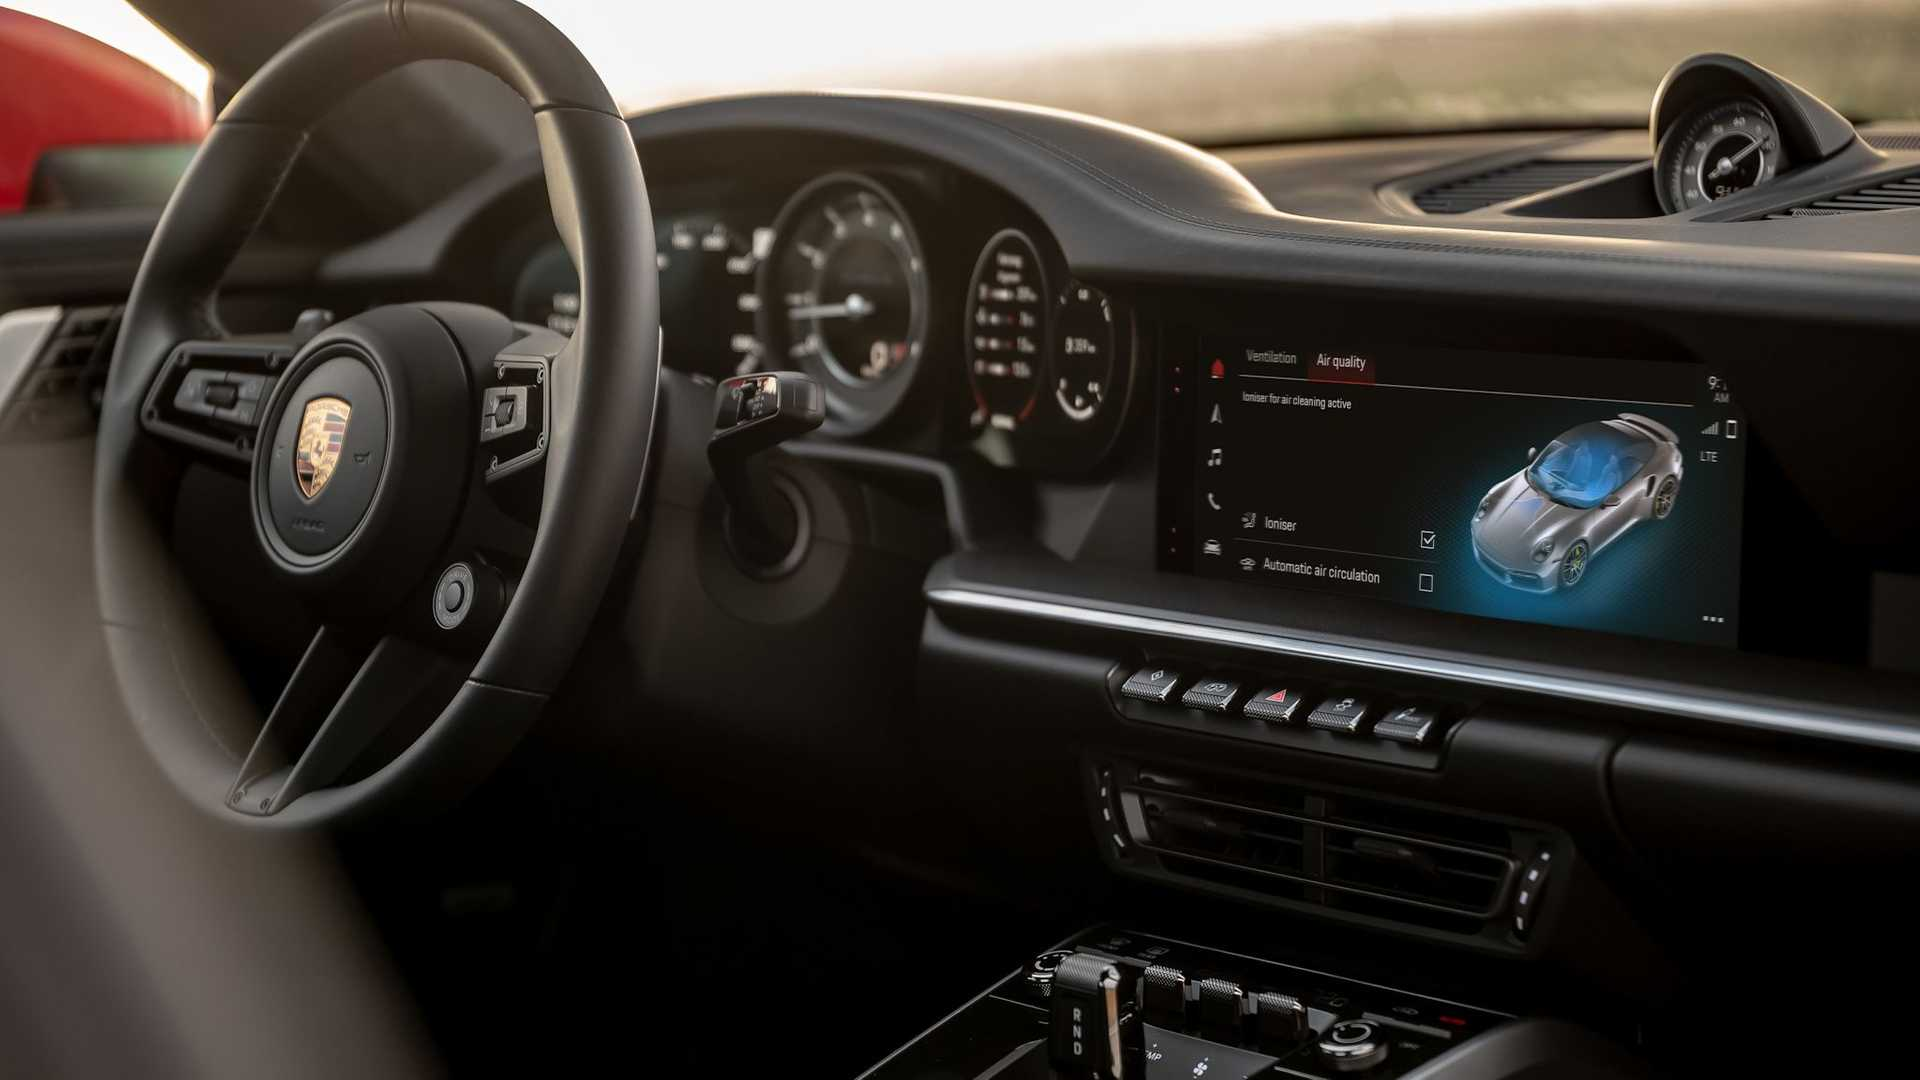 Porsche-Communication-Management-6-4